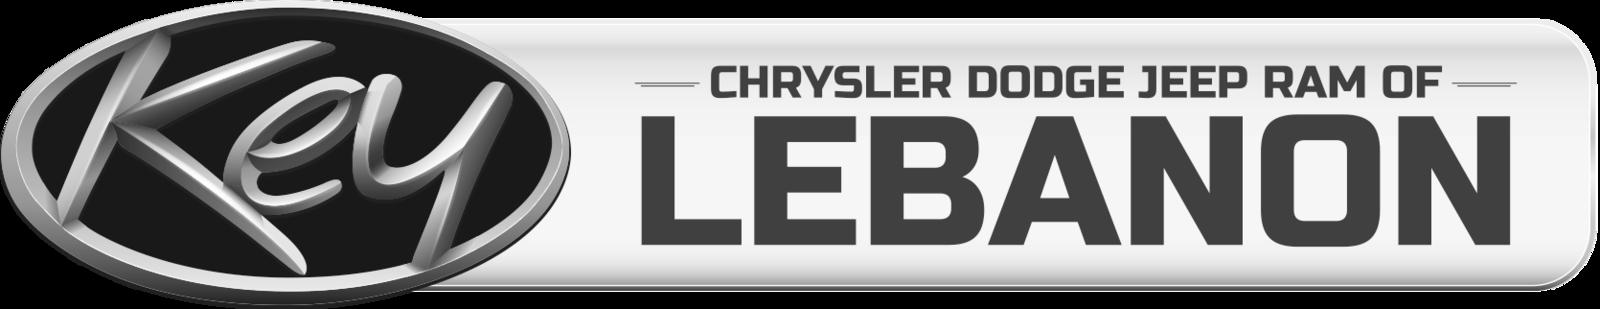 Key Chrysler Dodge Jeep Ram Of Lebanon Lebanon Nh Lee